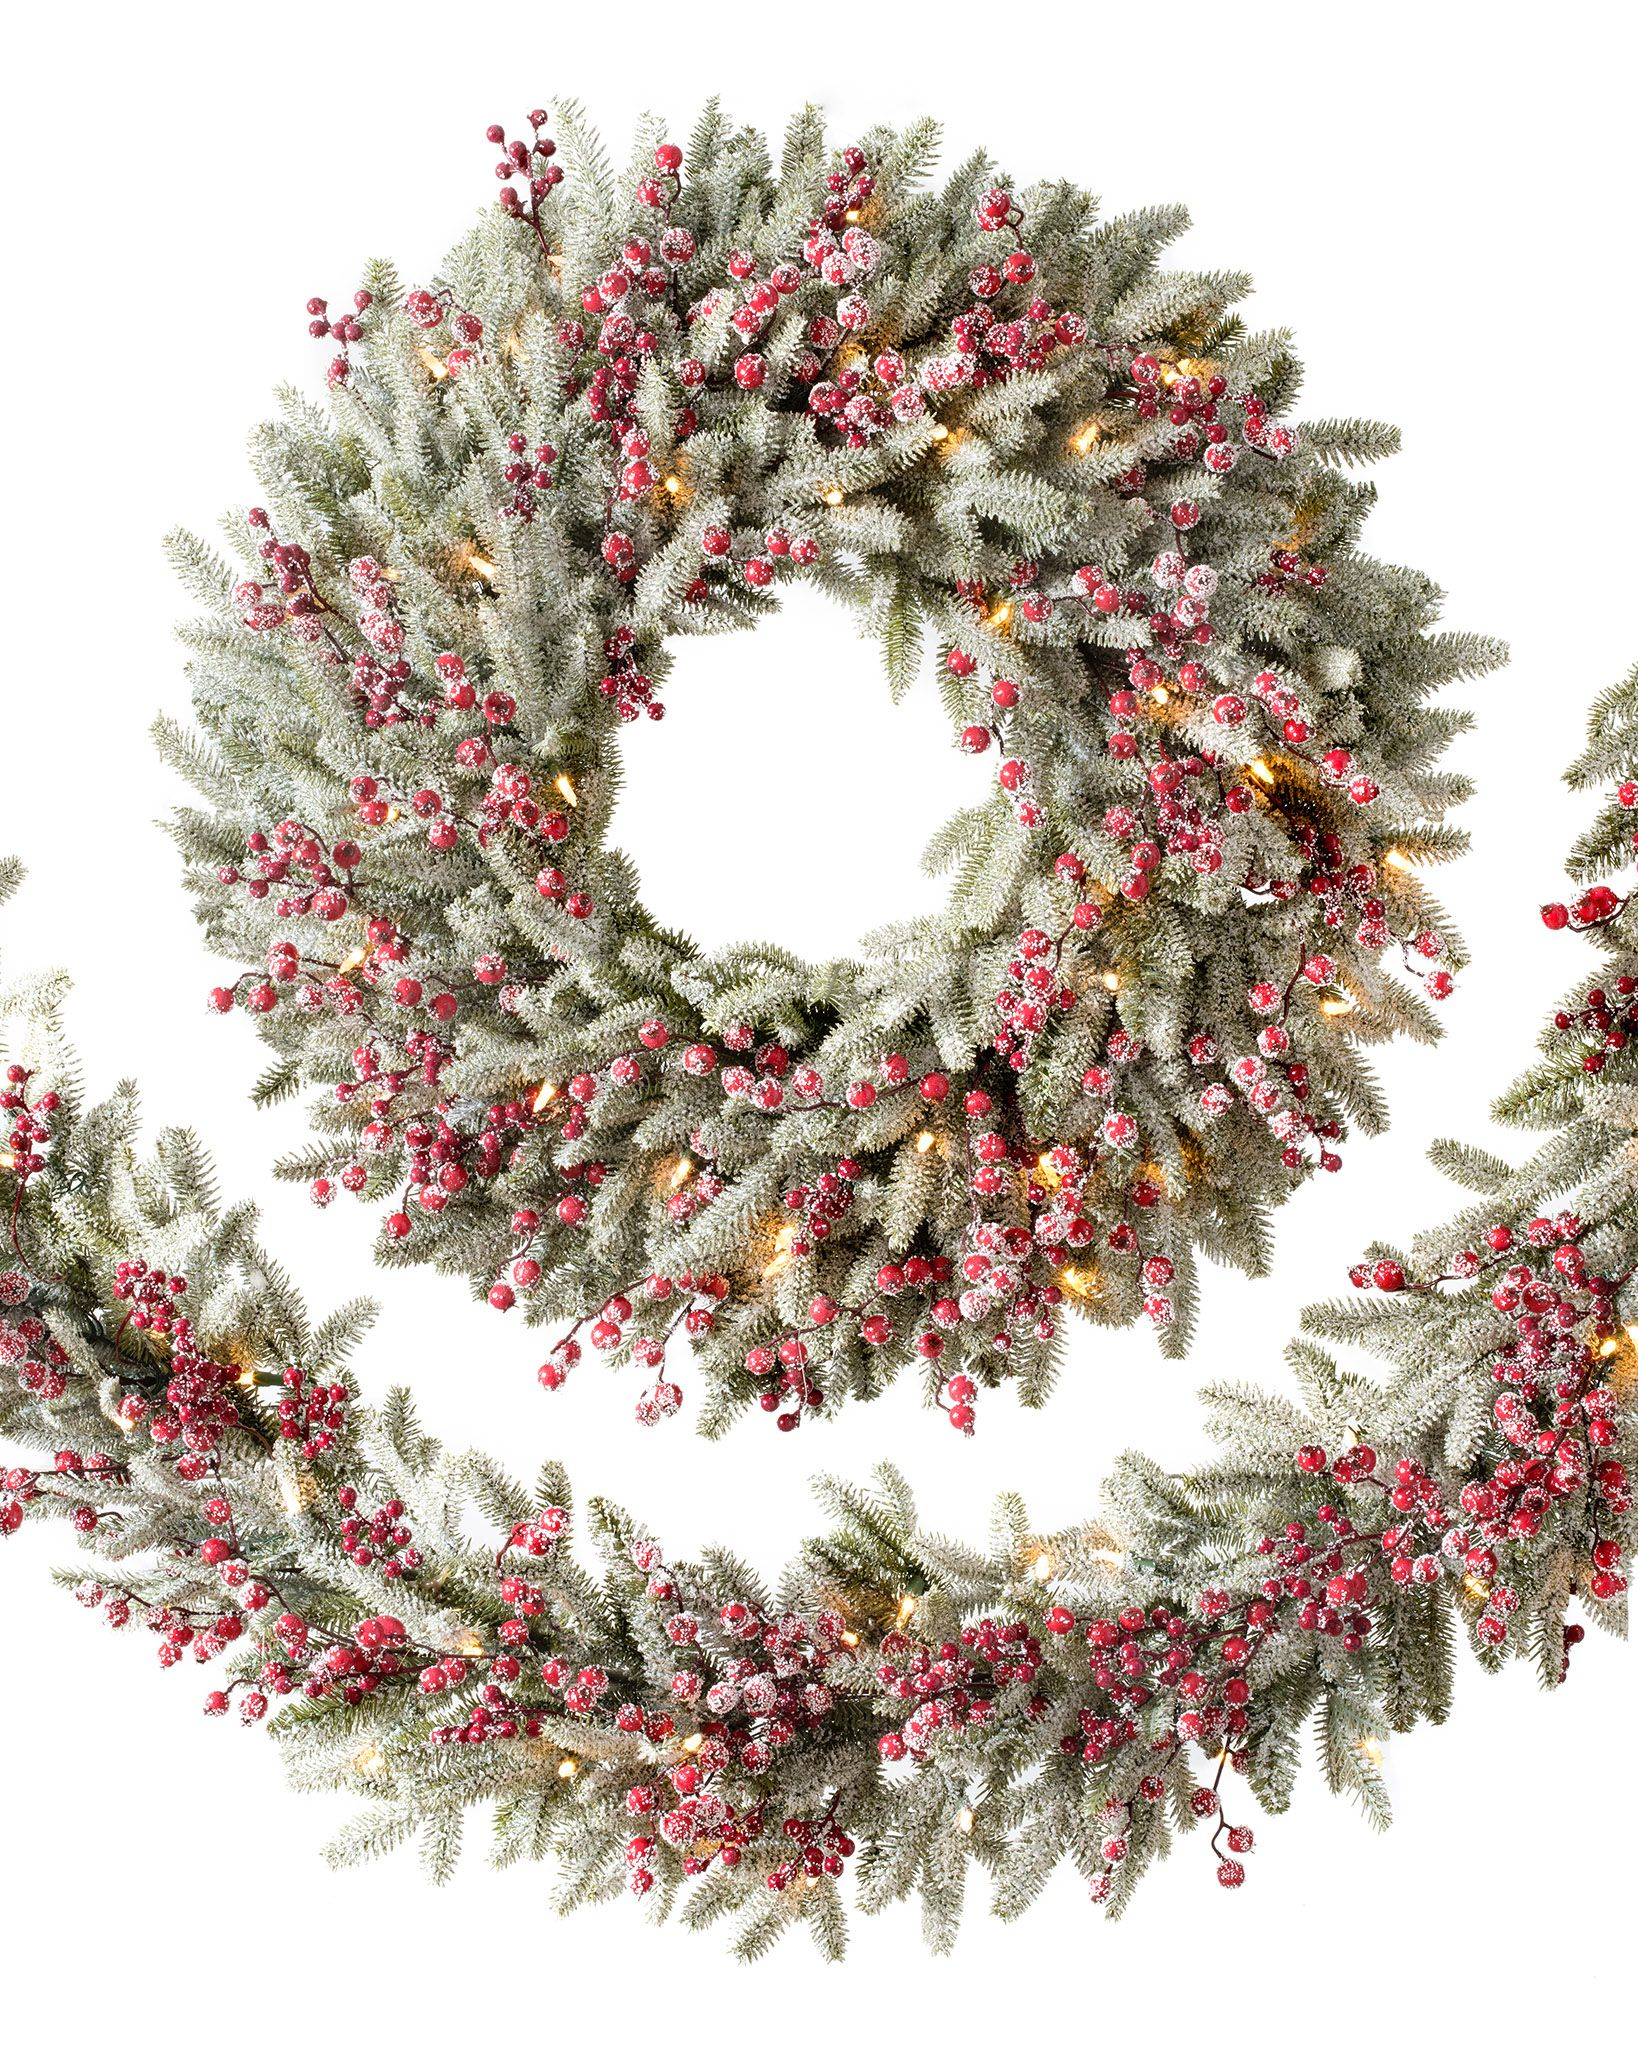 Famous Artificial Christmas Wreaths, Garlands & Foliage | Balsam Hill WR98